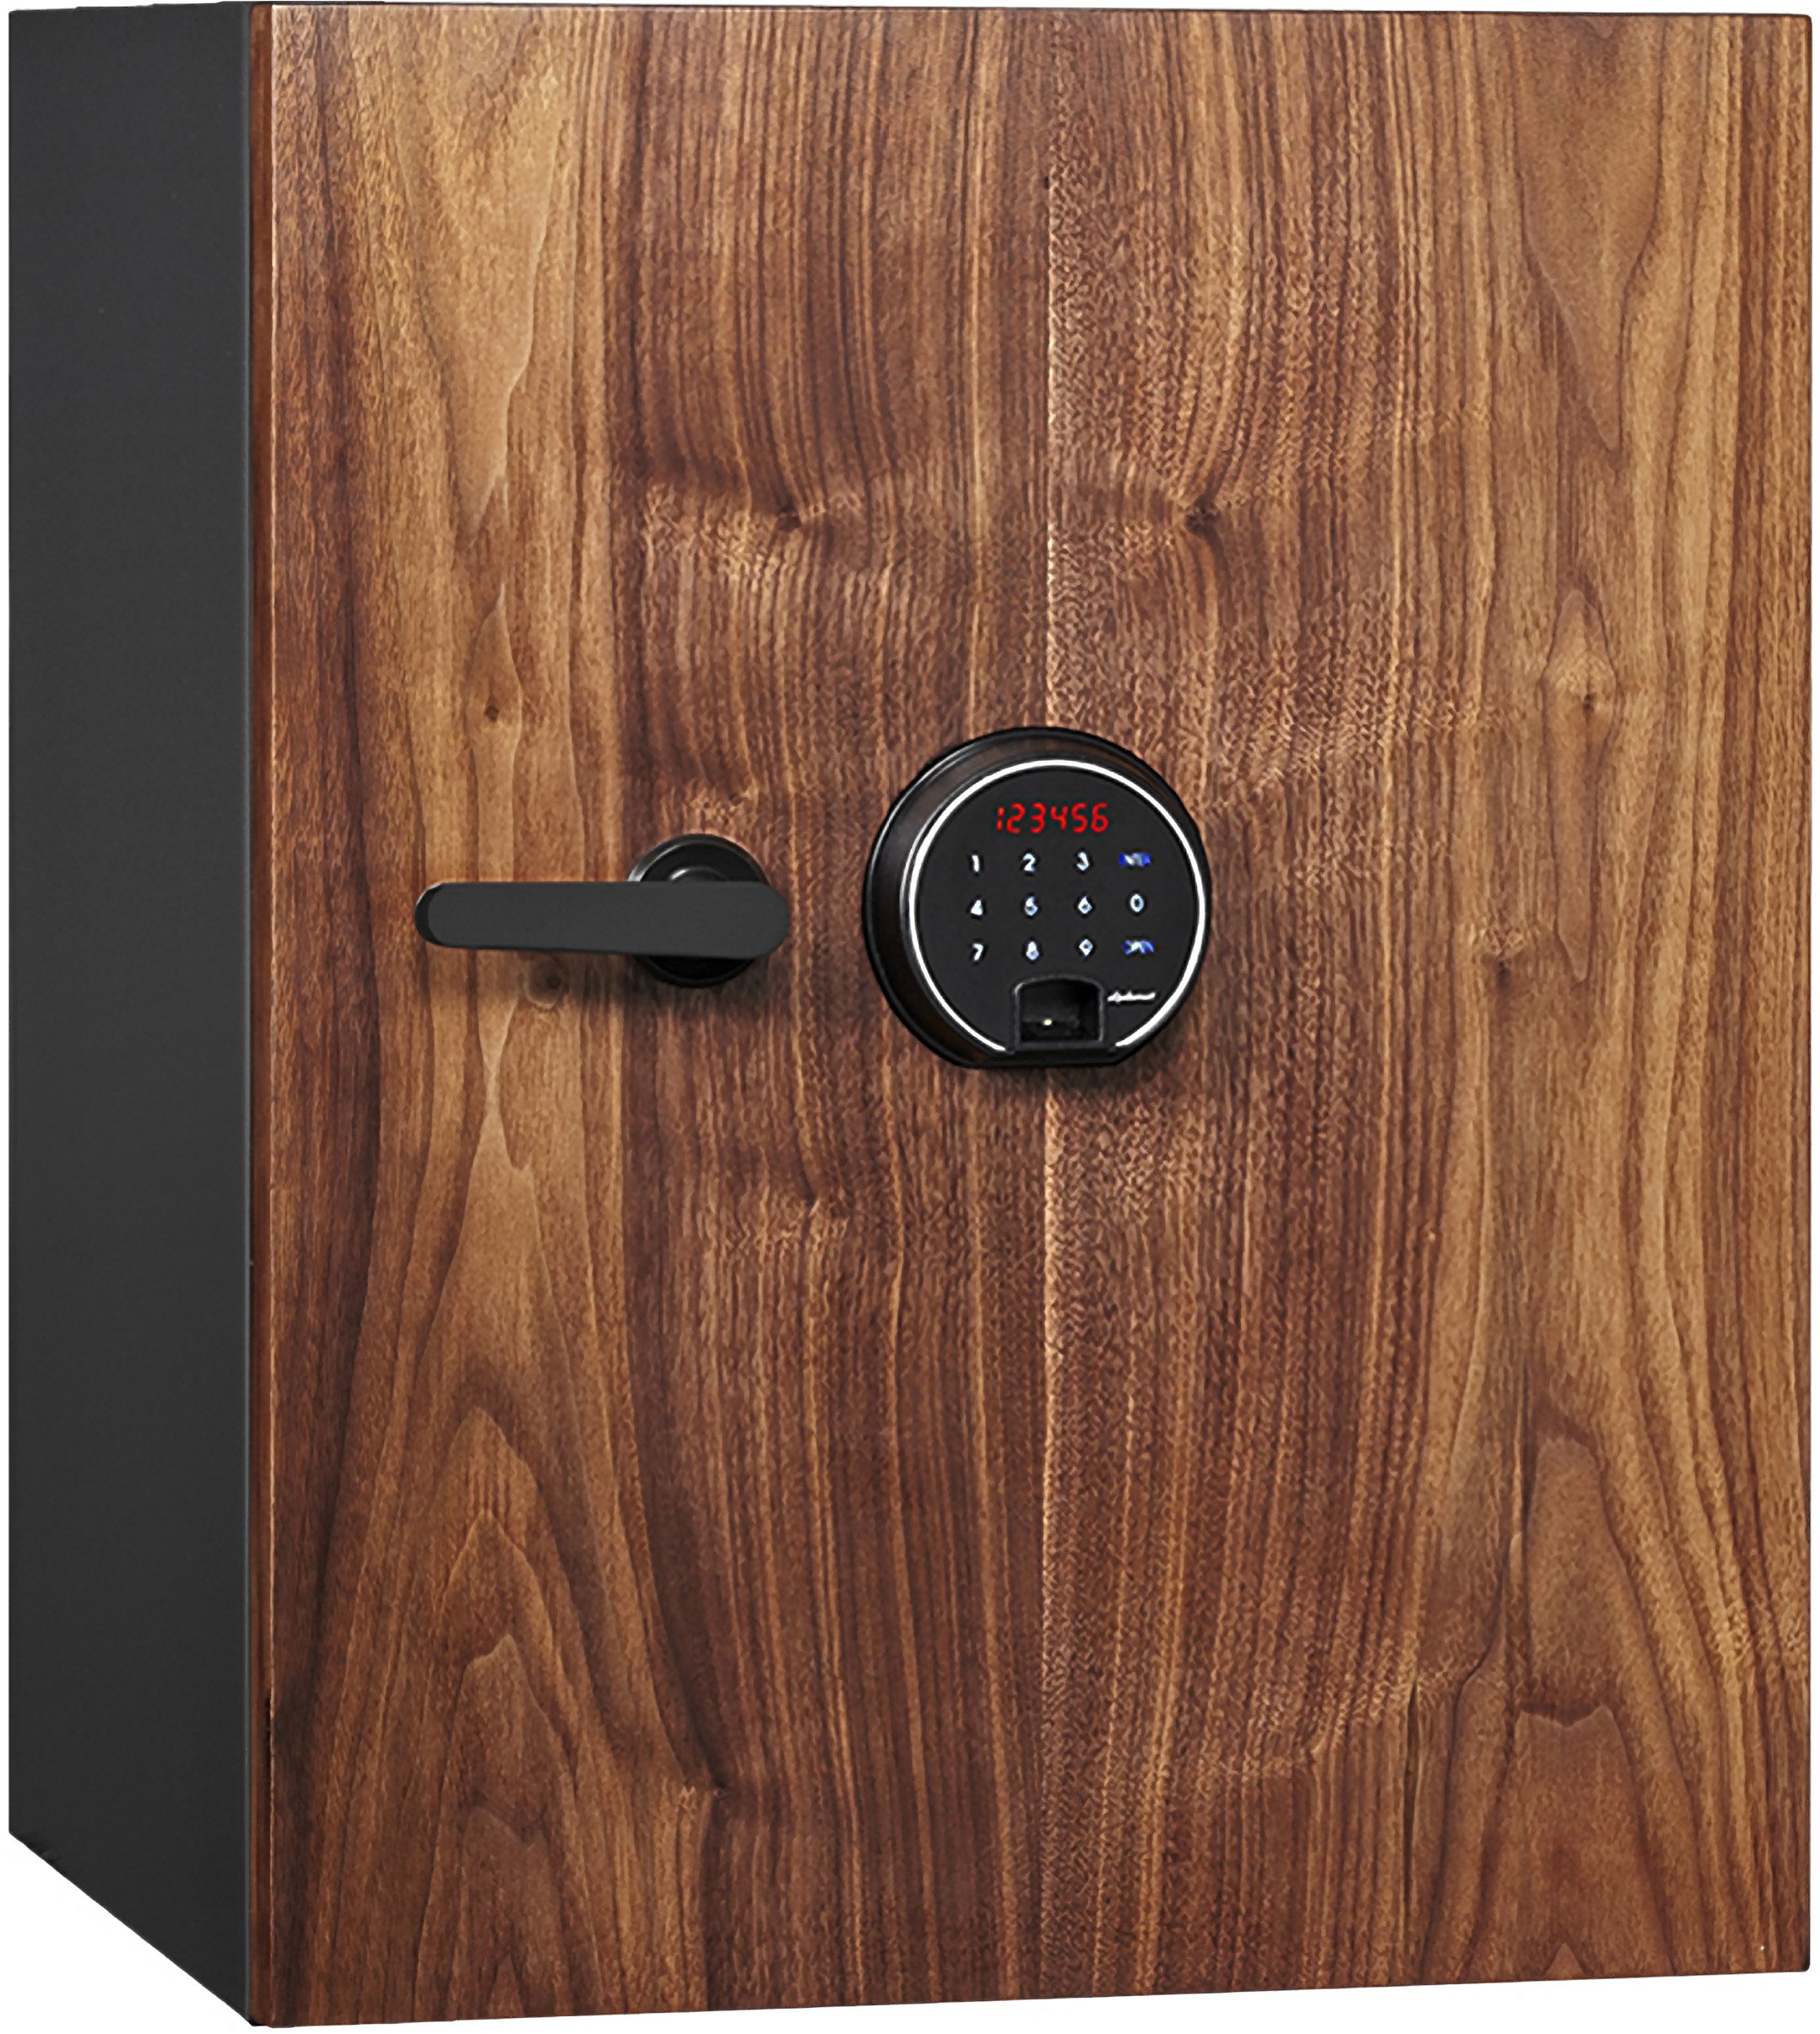 Phoenix DBAUM Fingerprint Lock Luxury Fireproof Safe with Walnut Door 2.28 cu ft